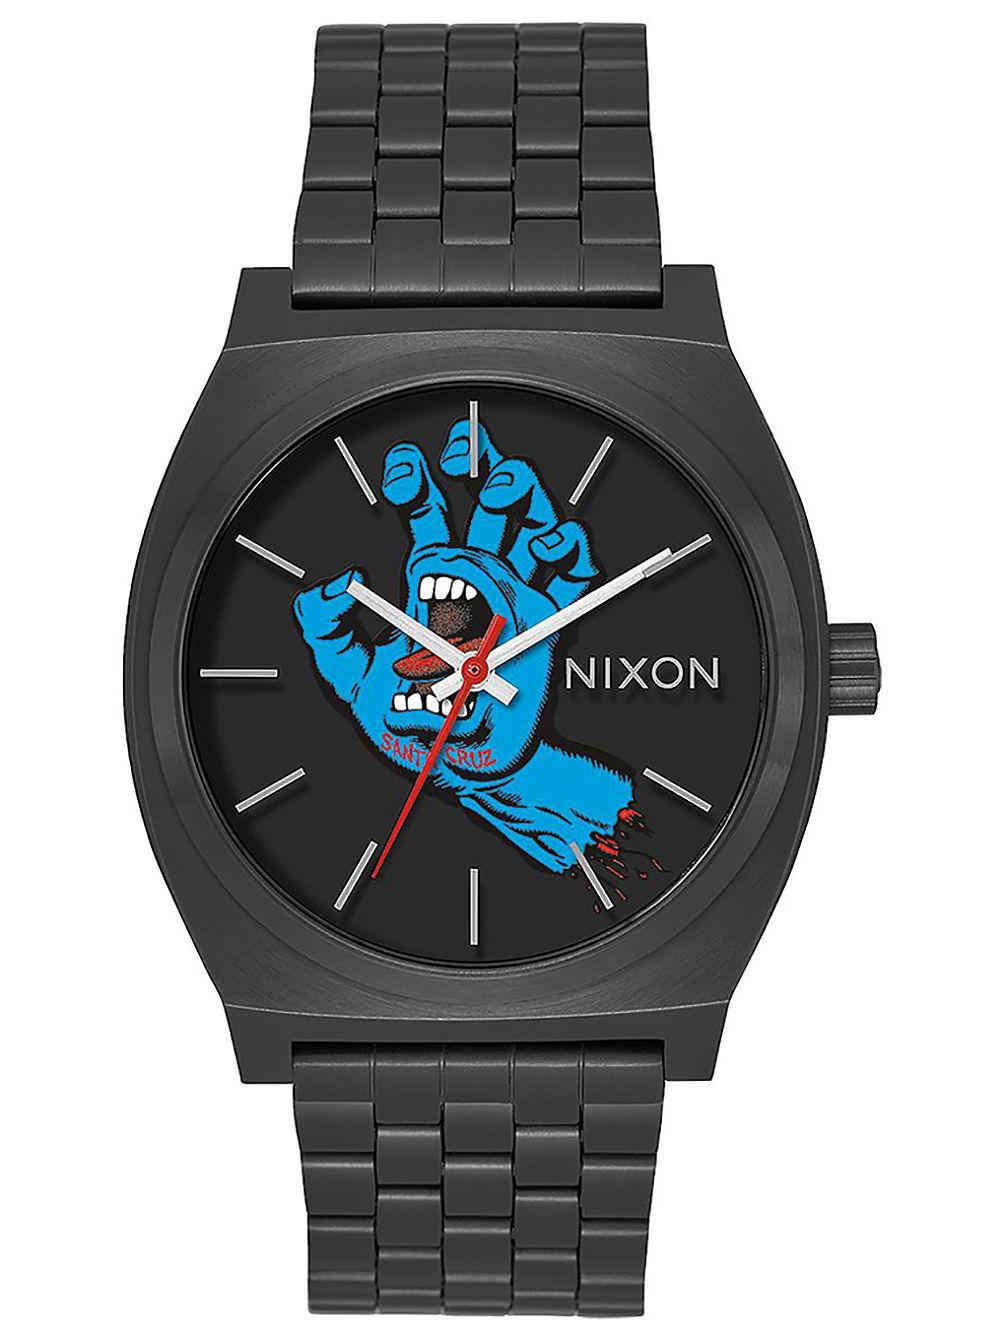 40a78c5a17d Buy Nixon X Santa Cruz The Time Teller online at Blue Tomato